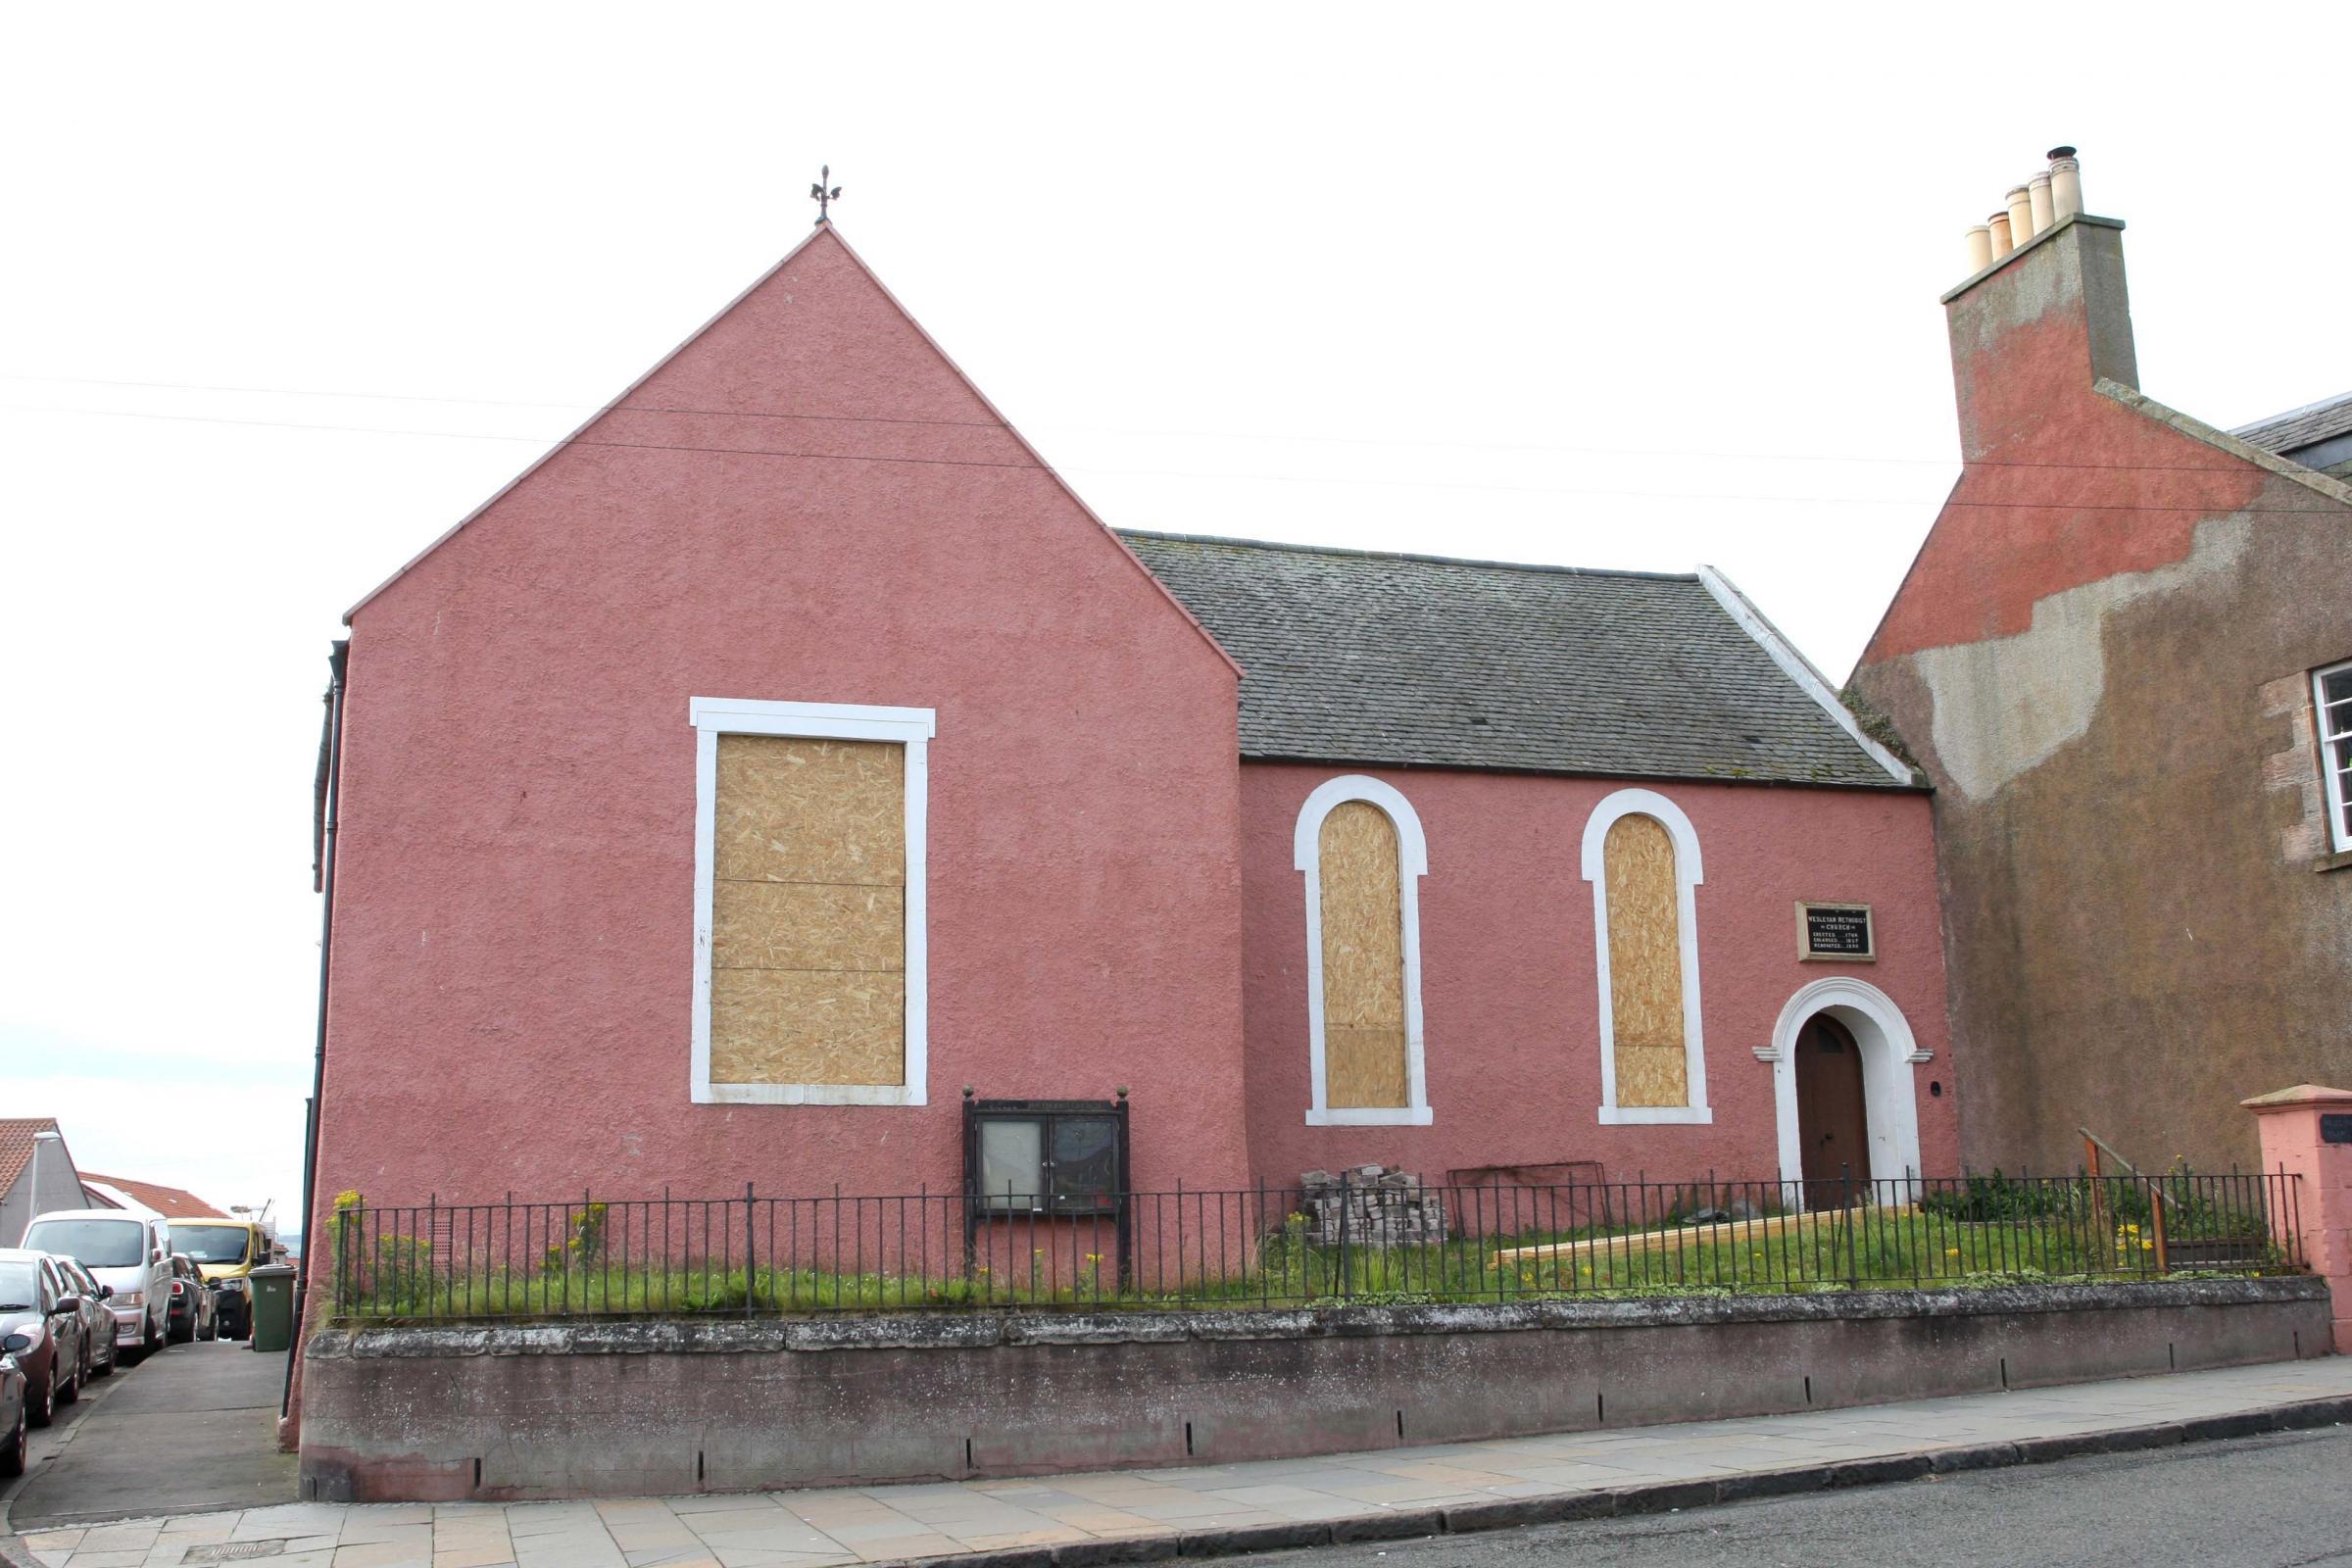 Bid to breathe new life into historic church building